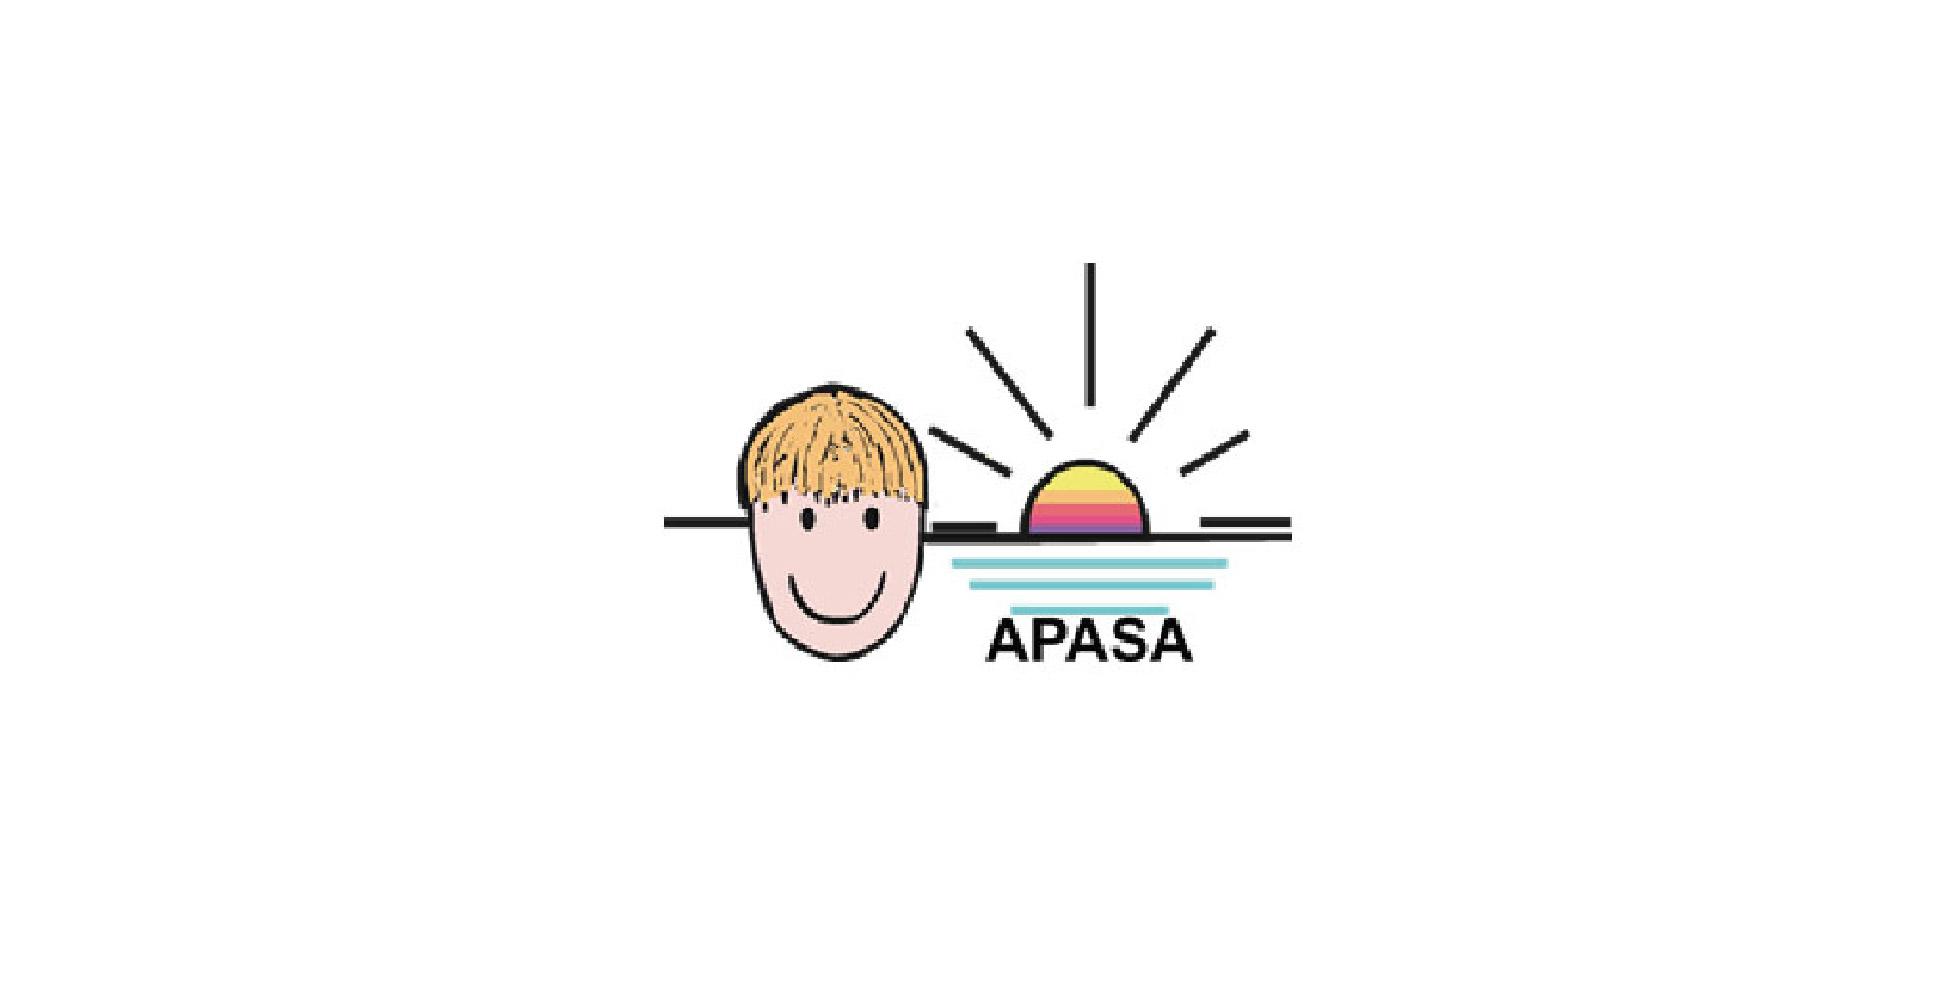 apasa